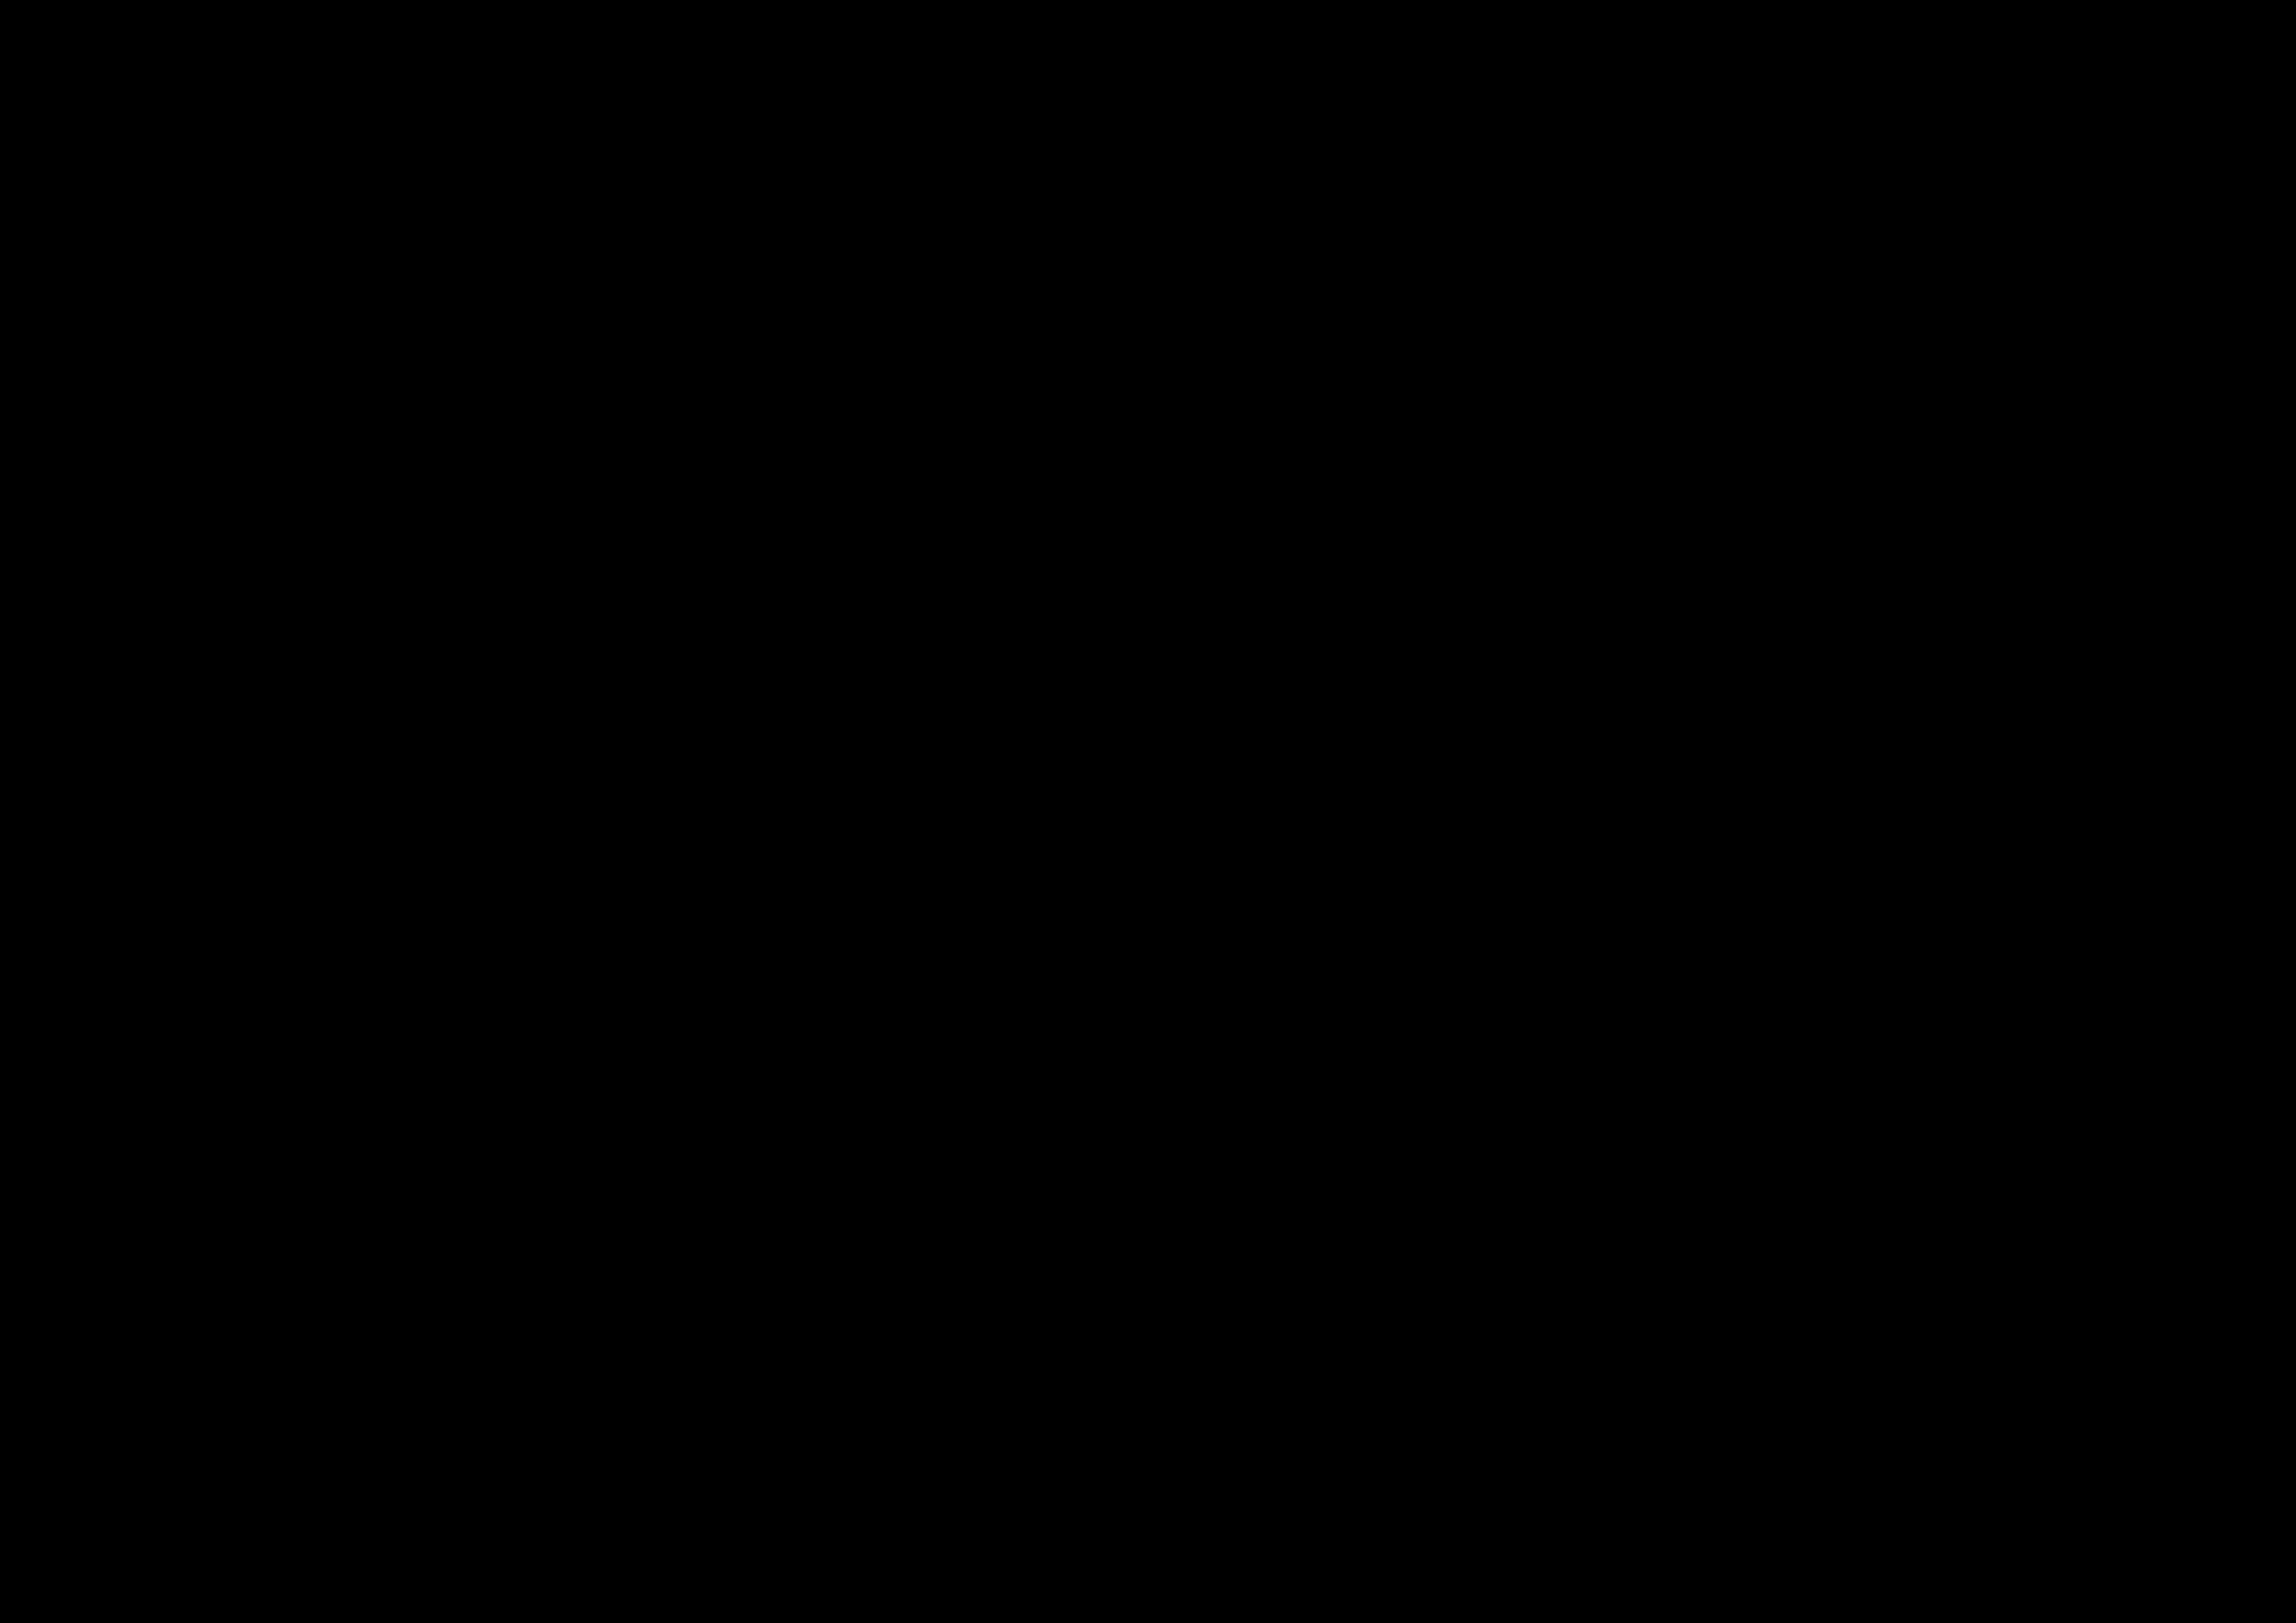 Clipart - Dibujante